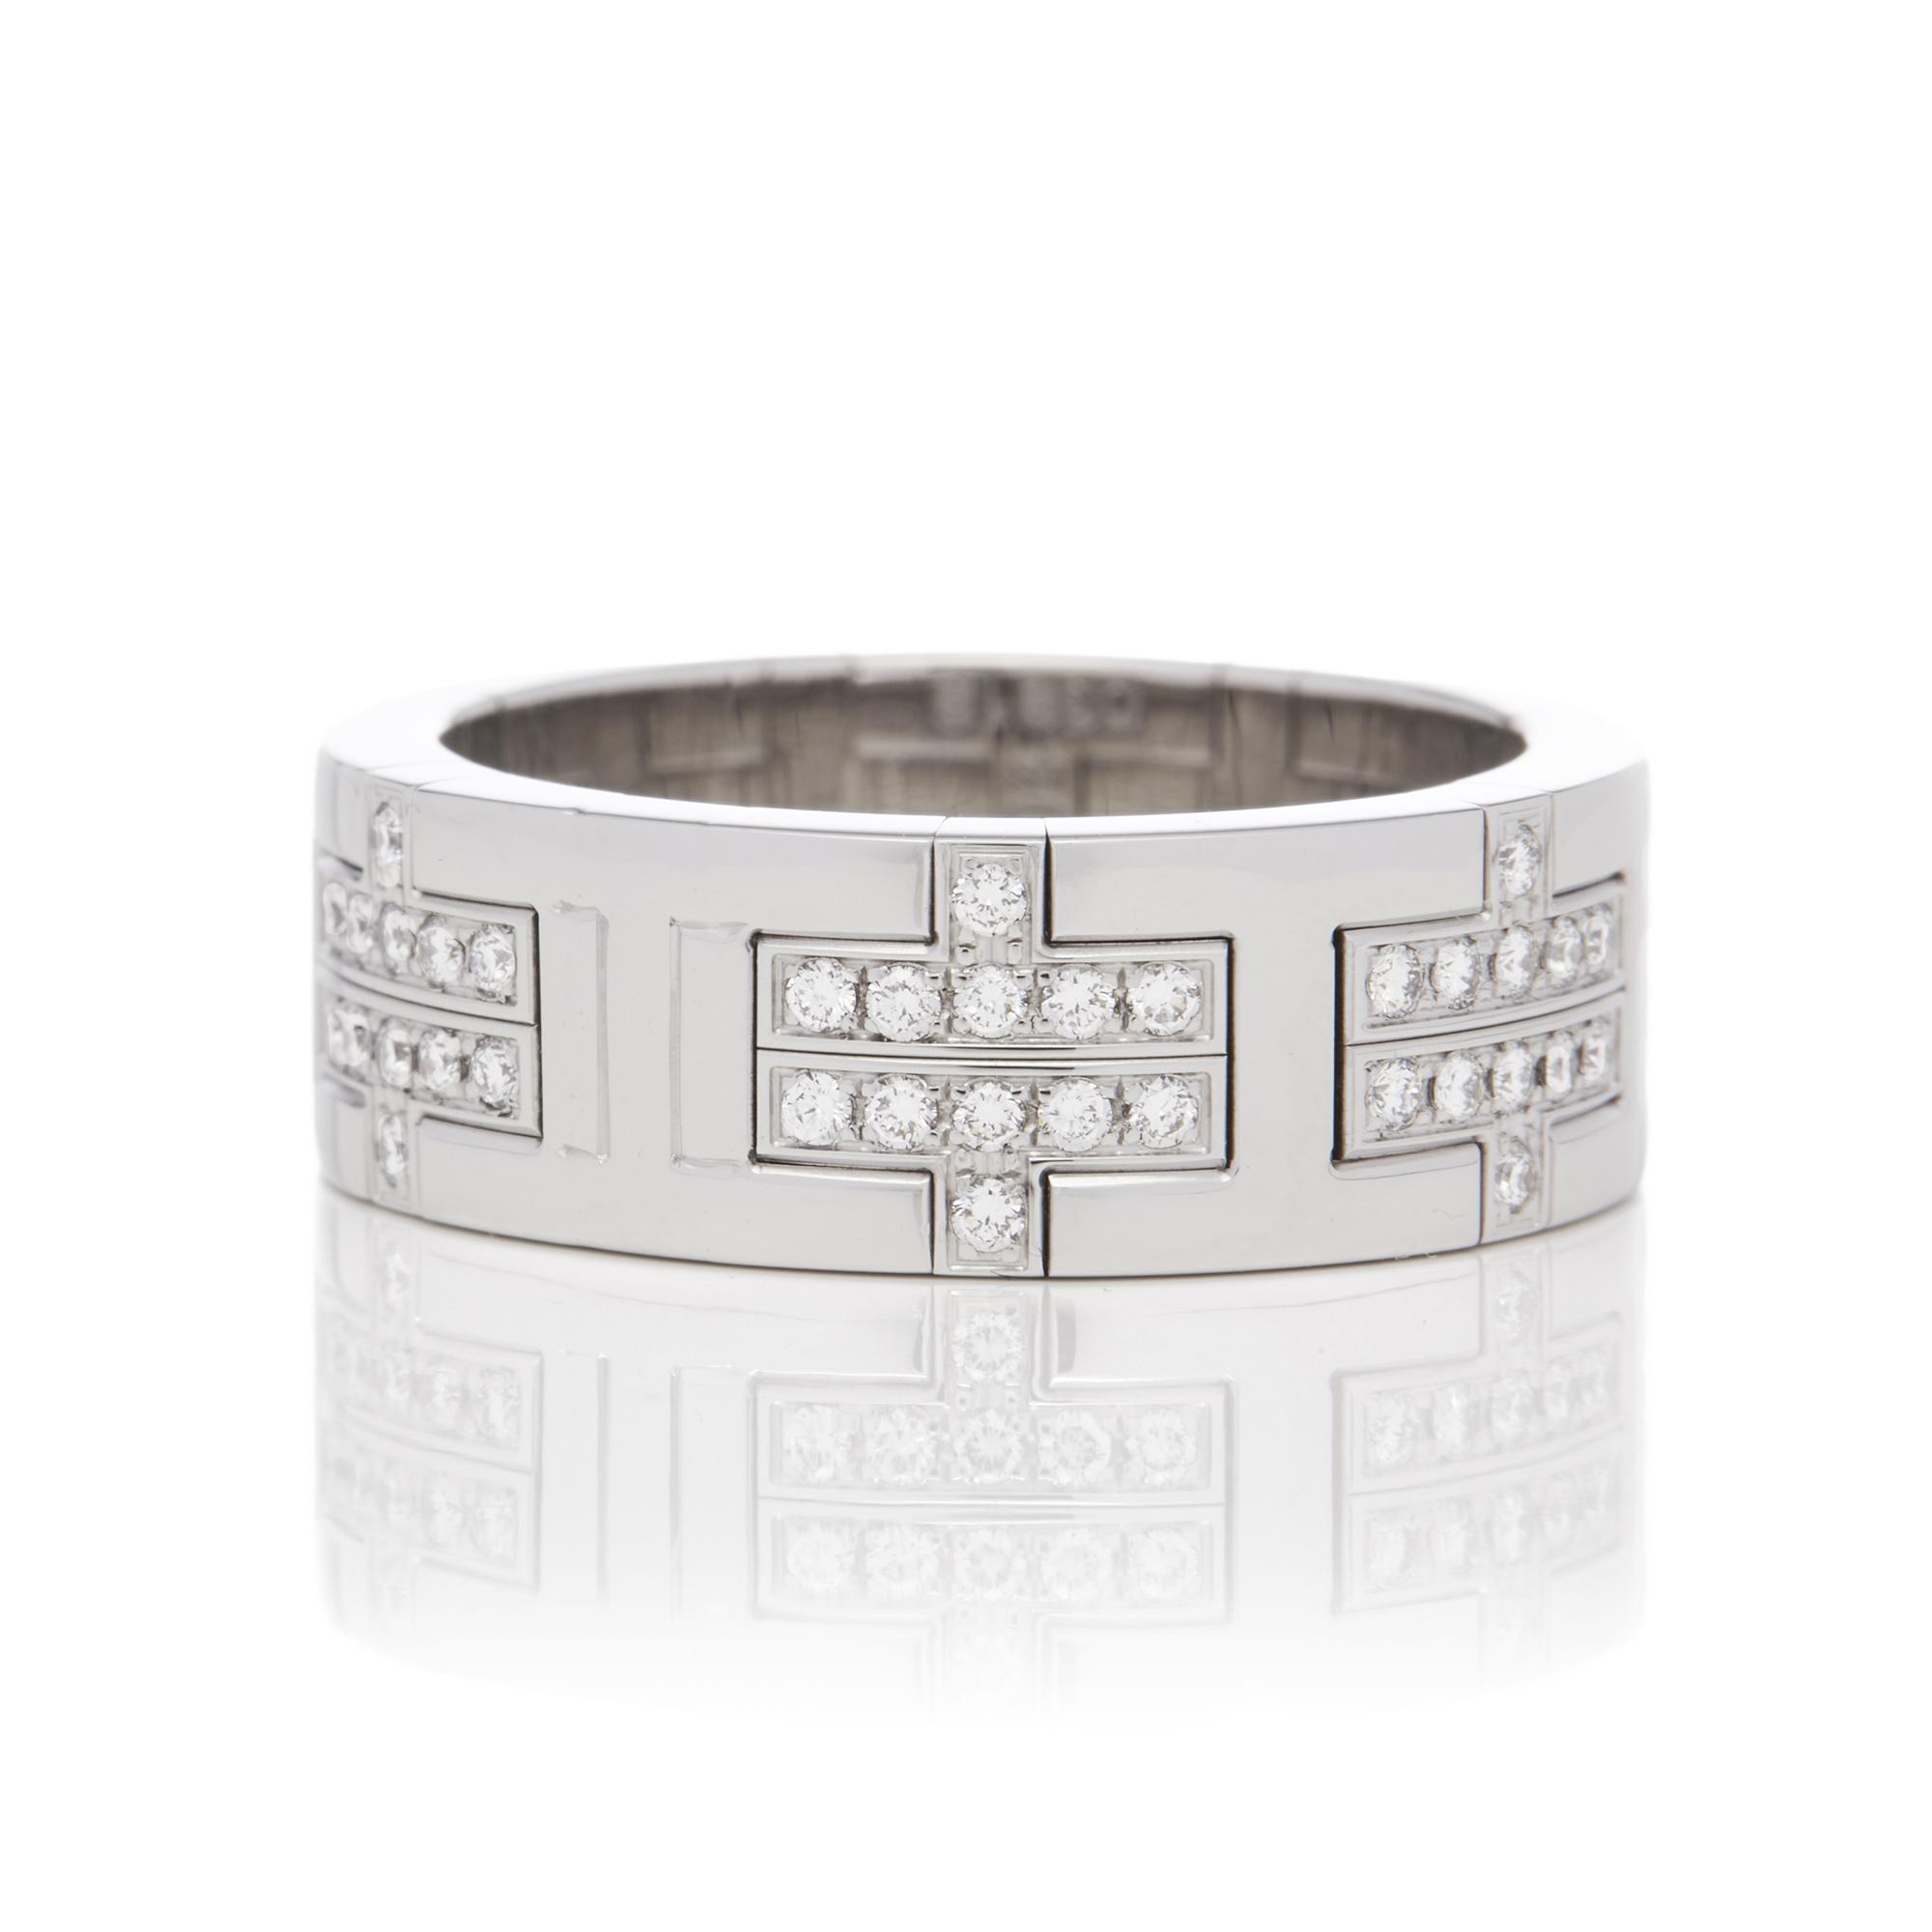 Hermes 18ct White Gold Kilim Diamond Ring - Image 8 of 8